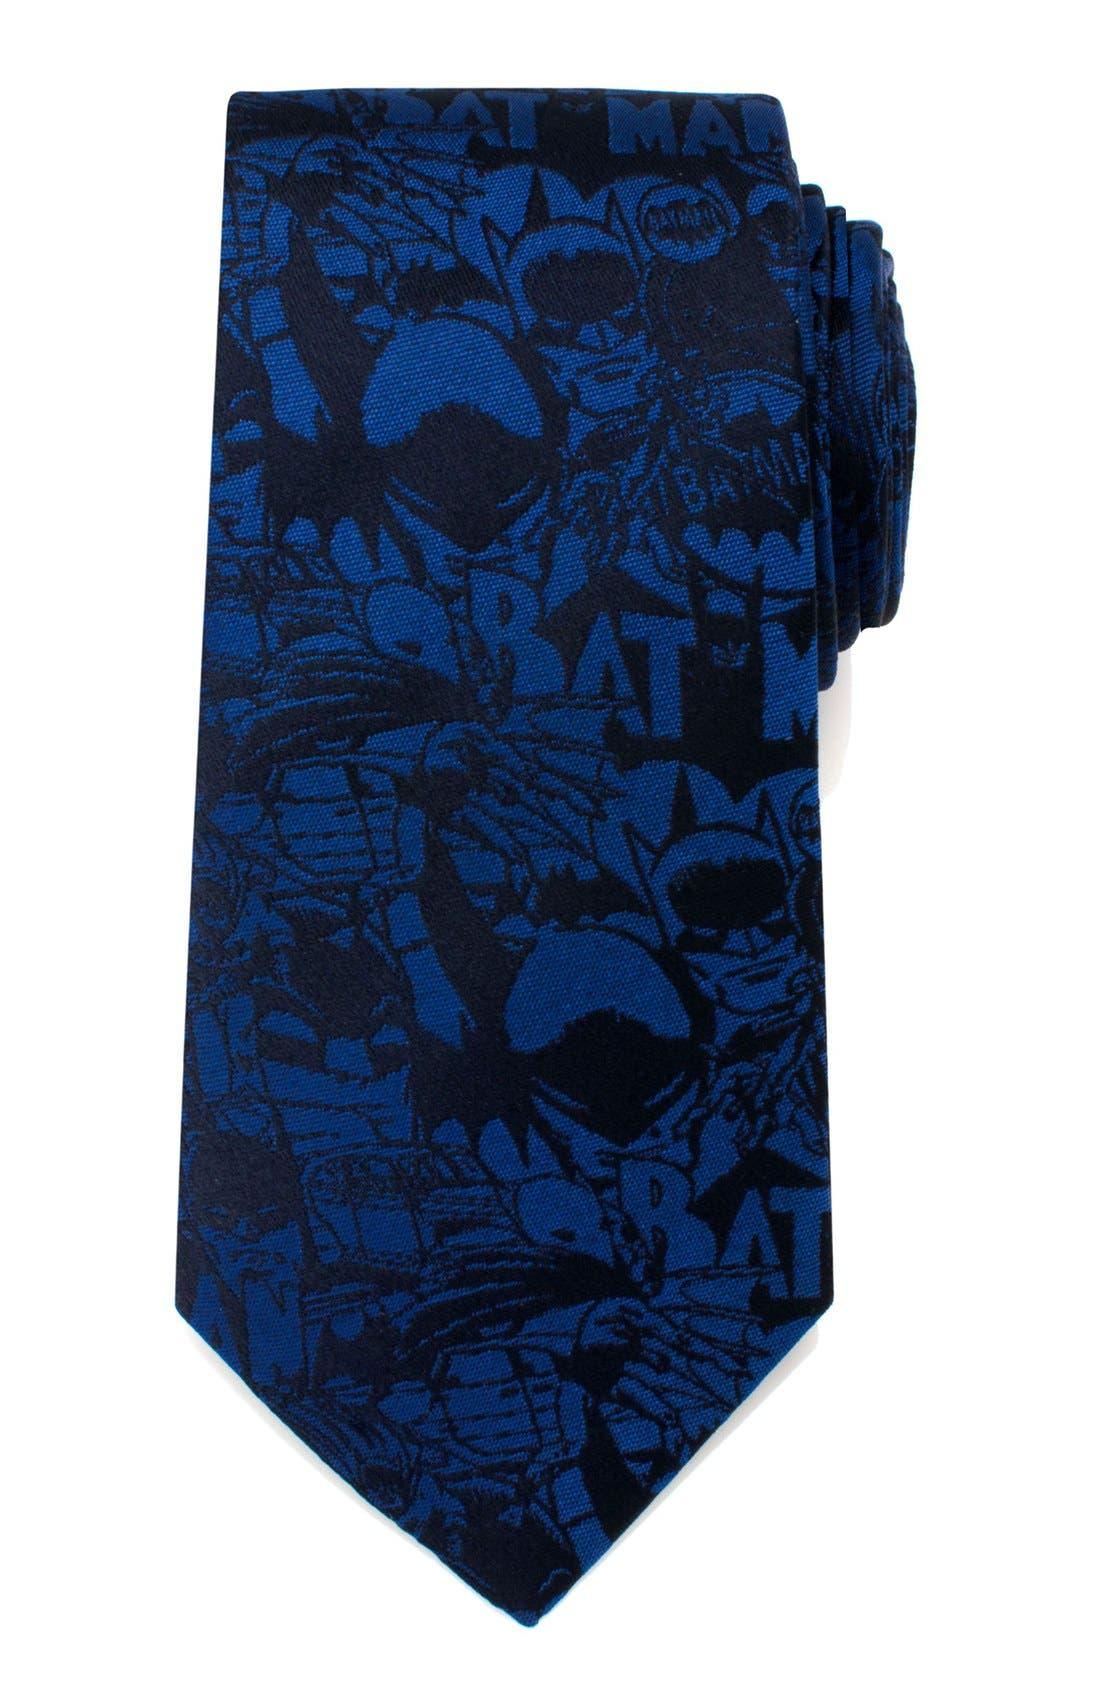 CUFFLINKS, INC. Batman Silk Tie